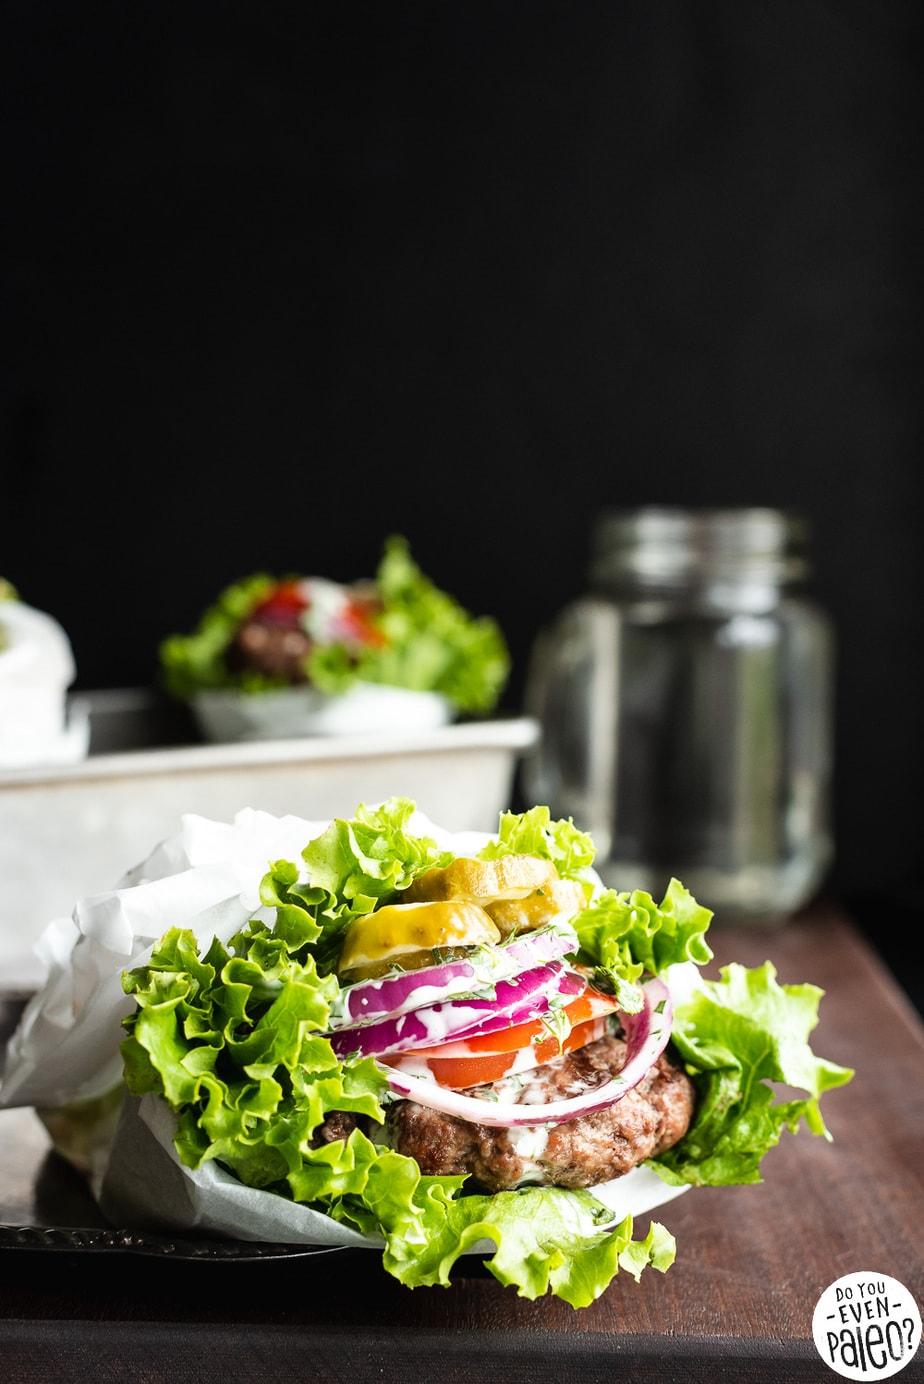 Easy Bunless Burgers with Cilantro Dill Mayo Sauce | DoYouEvenPaleo.net